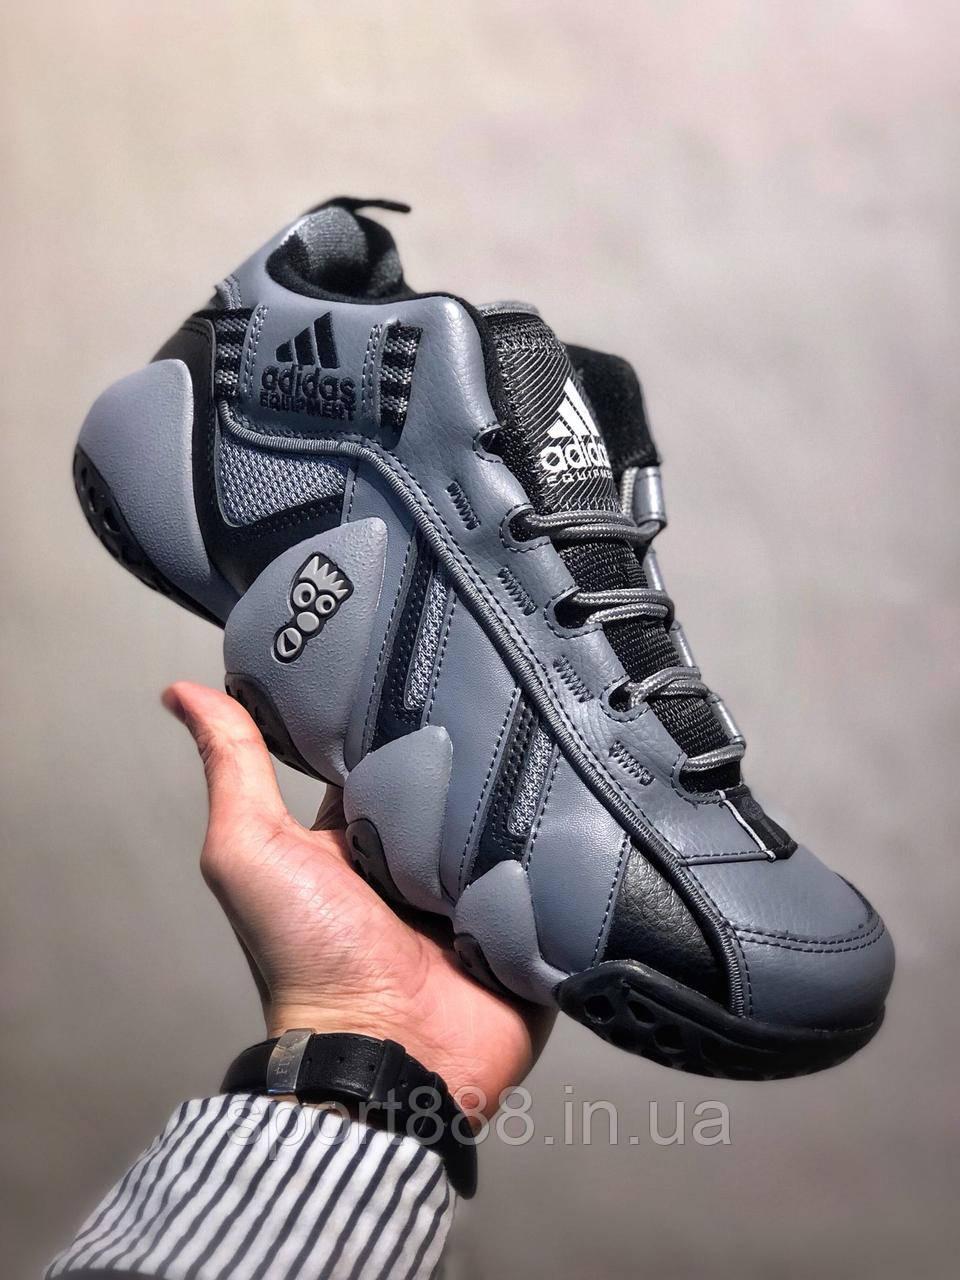 best loved d06b0 5c3c5 Adidas Originals EQT Key Trainer Keyshawn Johnson мужские кроссовки